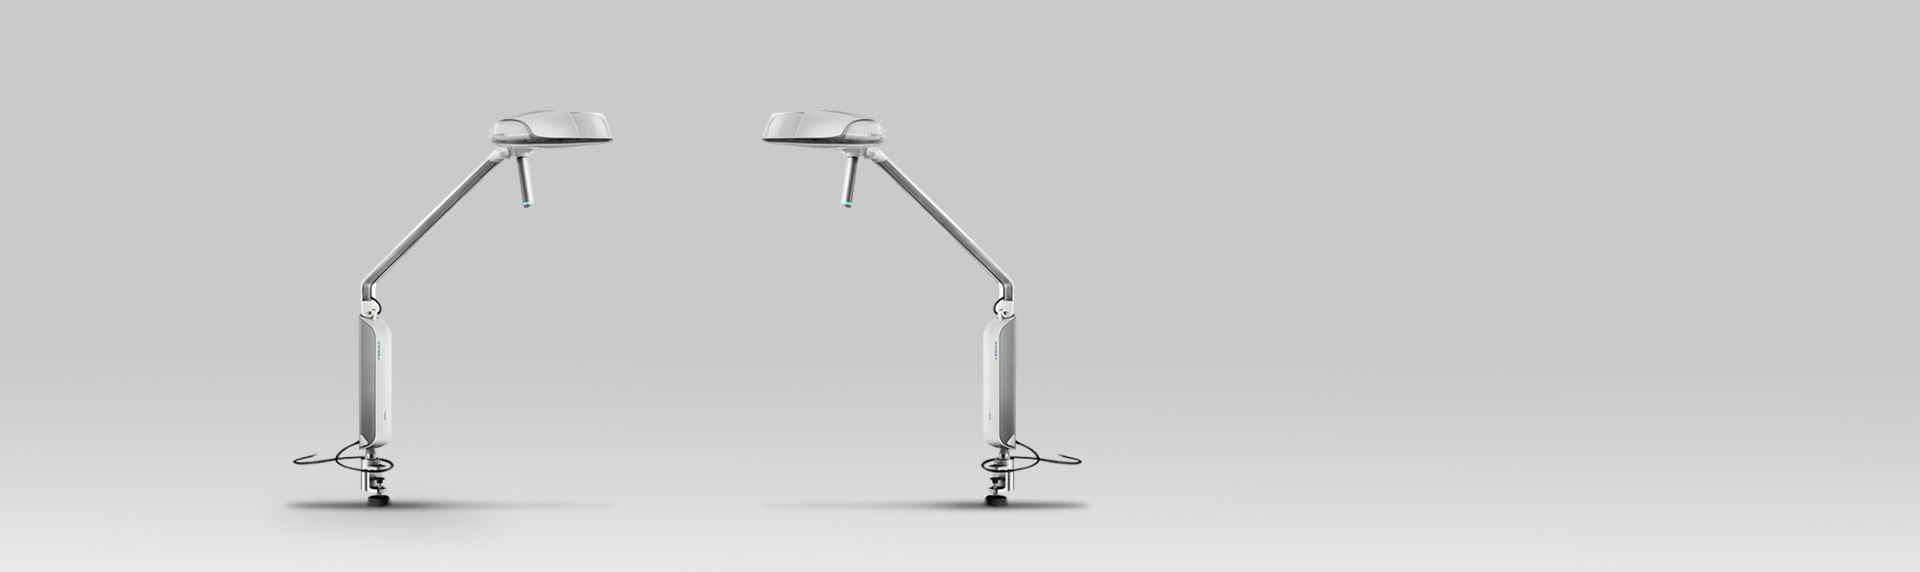 SSC设计-led检测灯